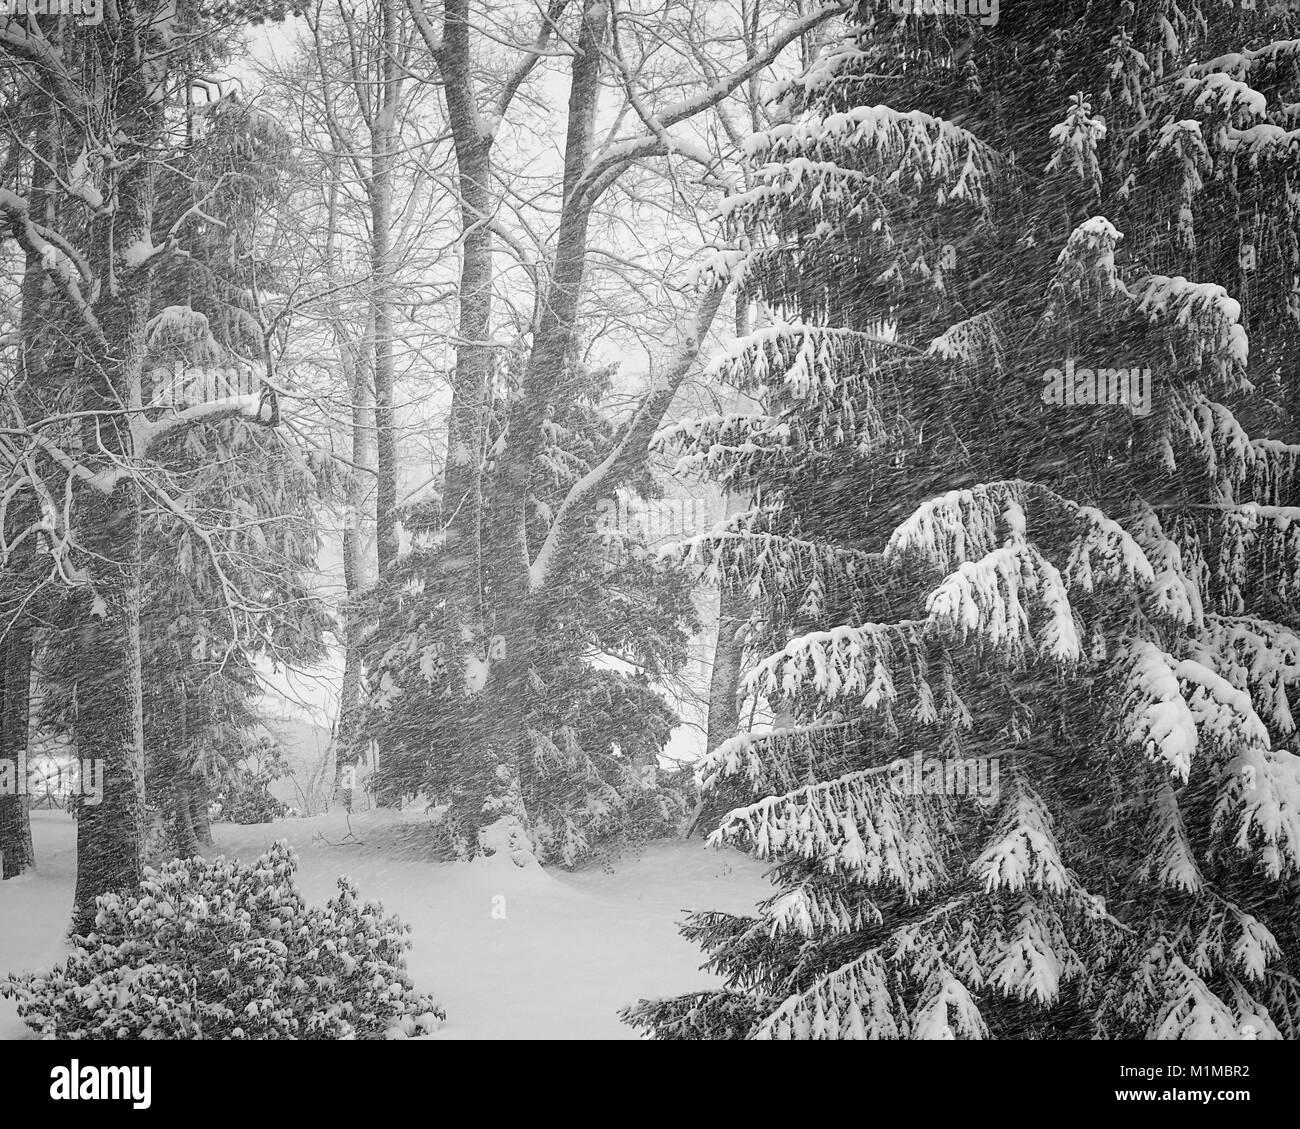 DE - BAVARIA: Wintertime at Bad Toelz - Stock Image